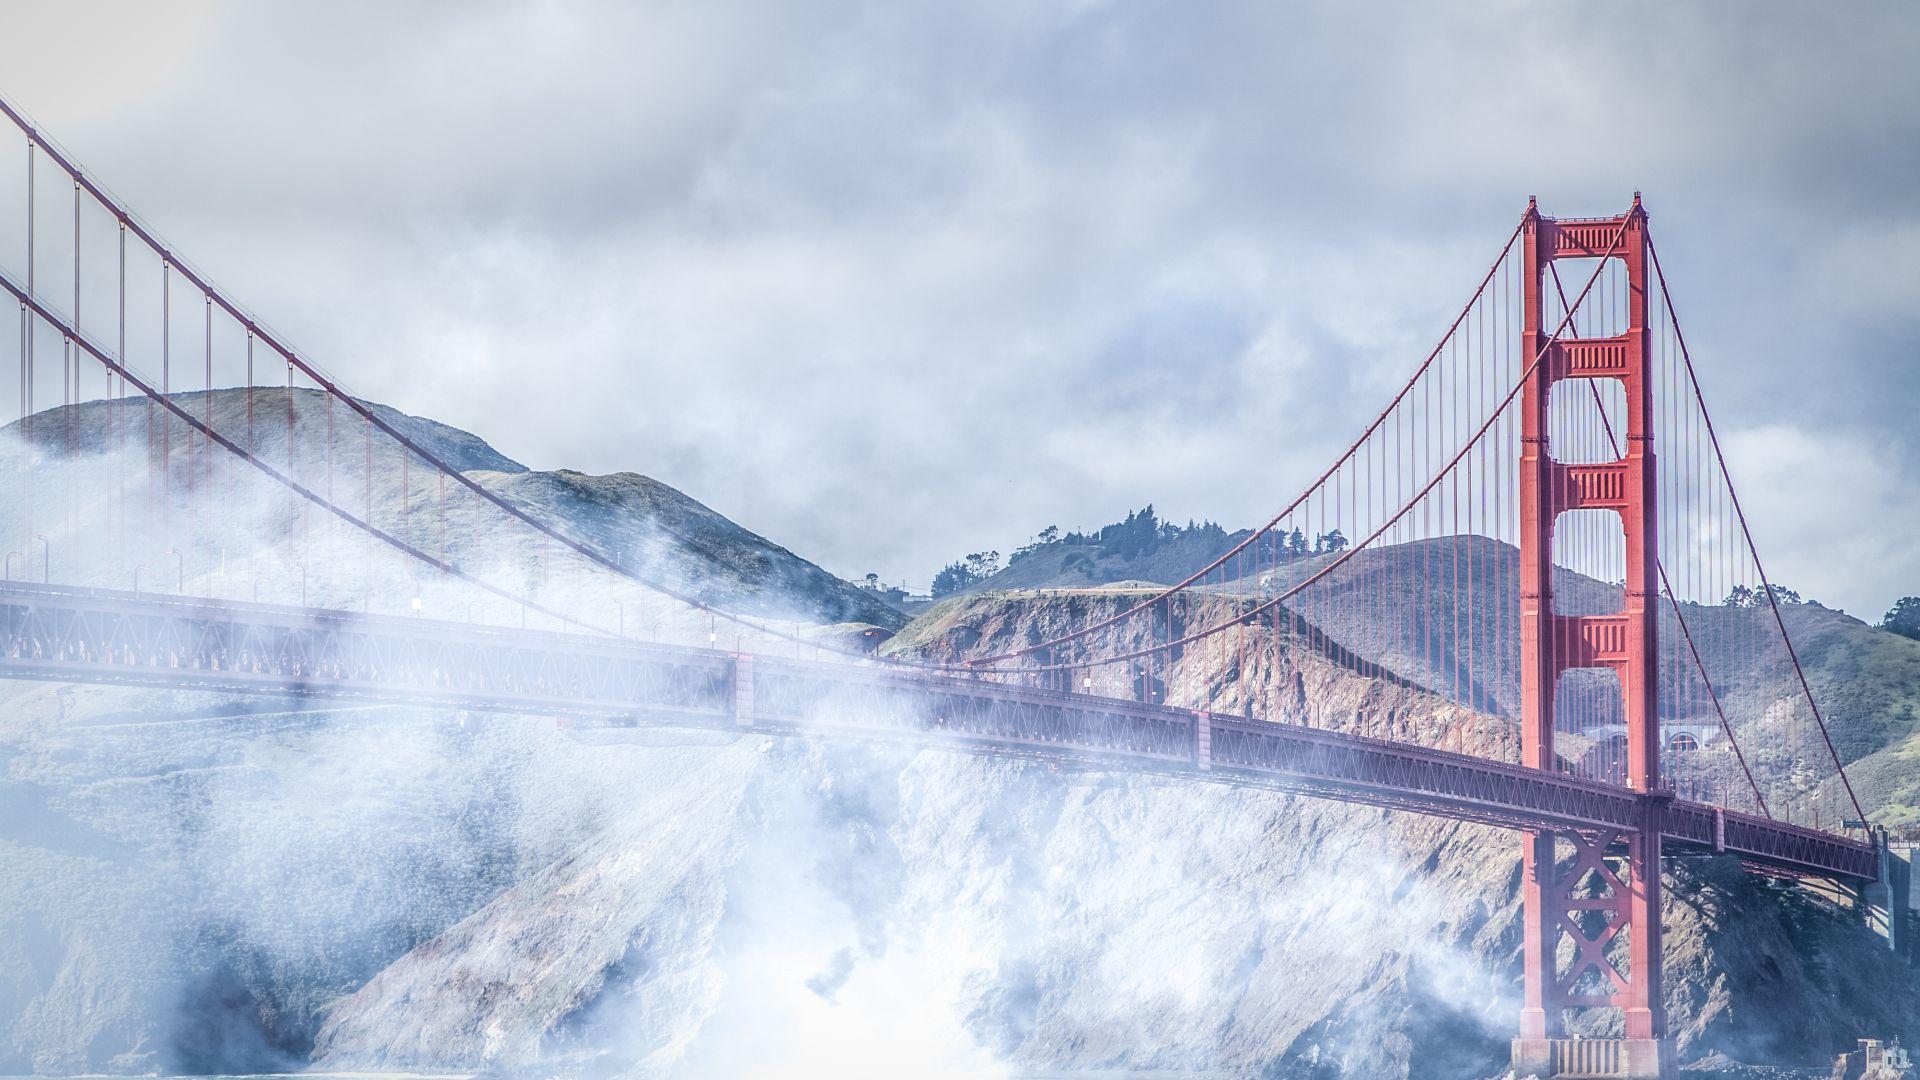 Wallpaper San Francisco, 4k, 5k wallpaper, Golden Gate, USA